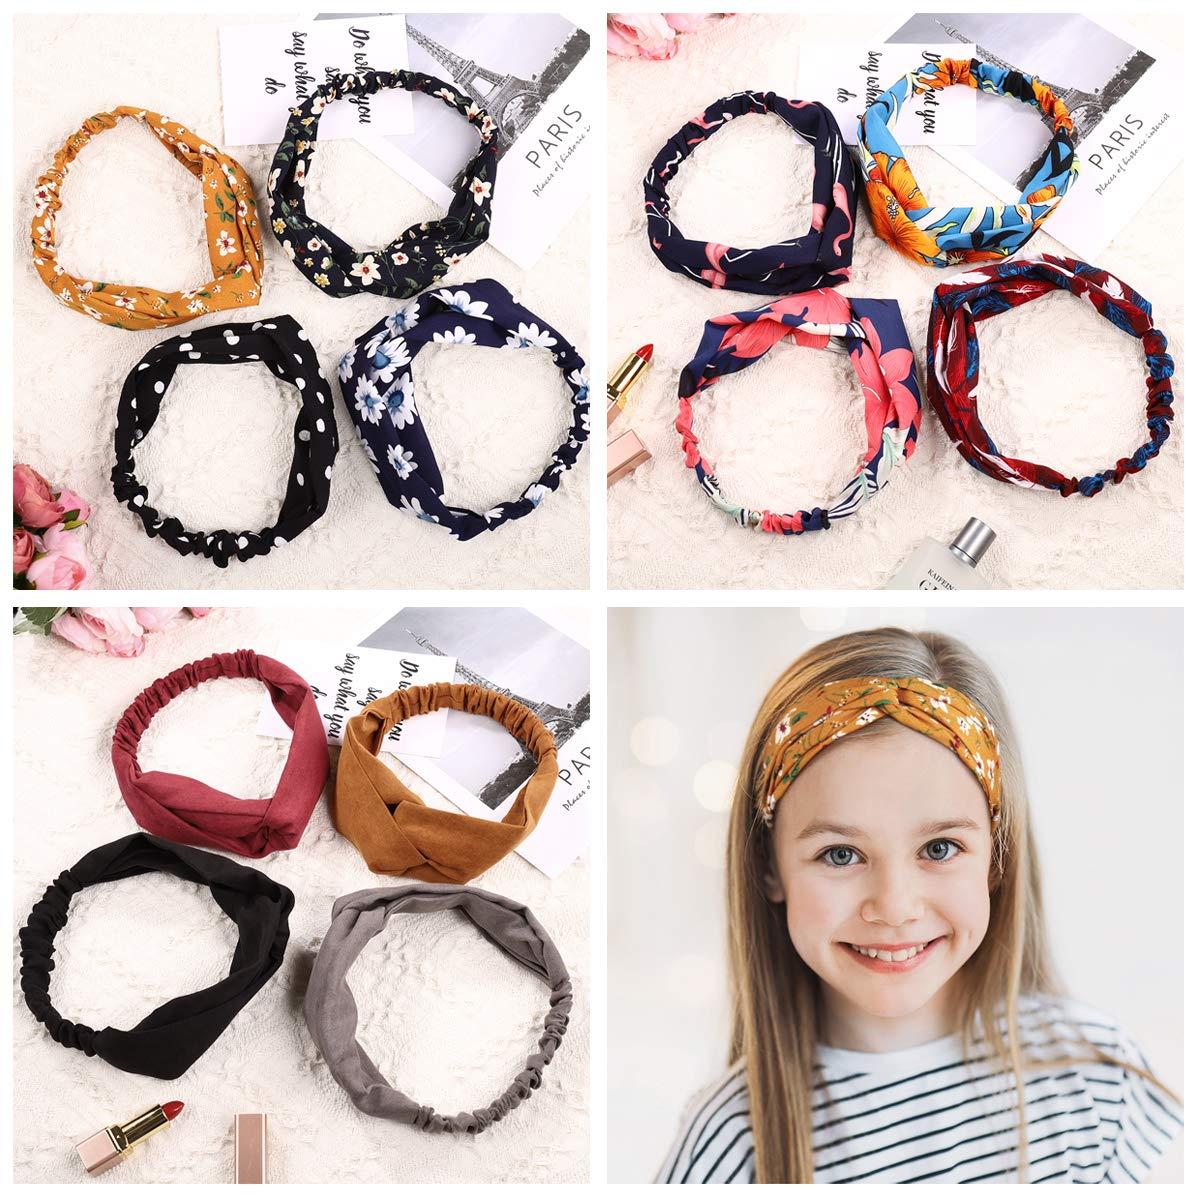 Head Wrap Headbands for Women Girls, Knot Headband Head Scarf Twisted Head Wrap 12Pcs